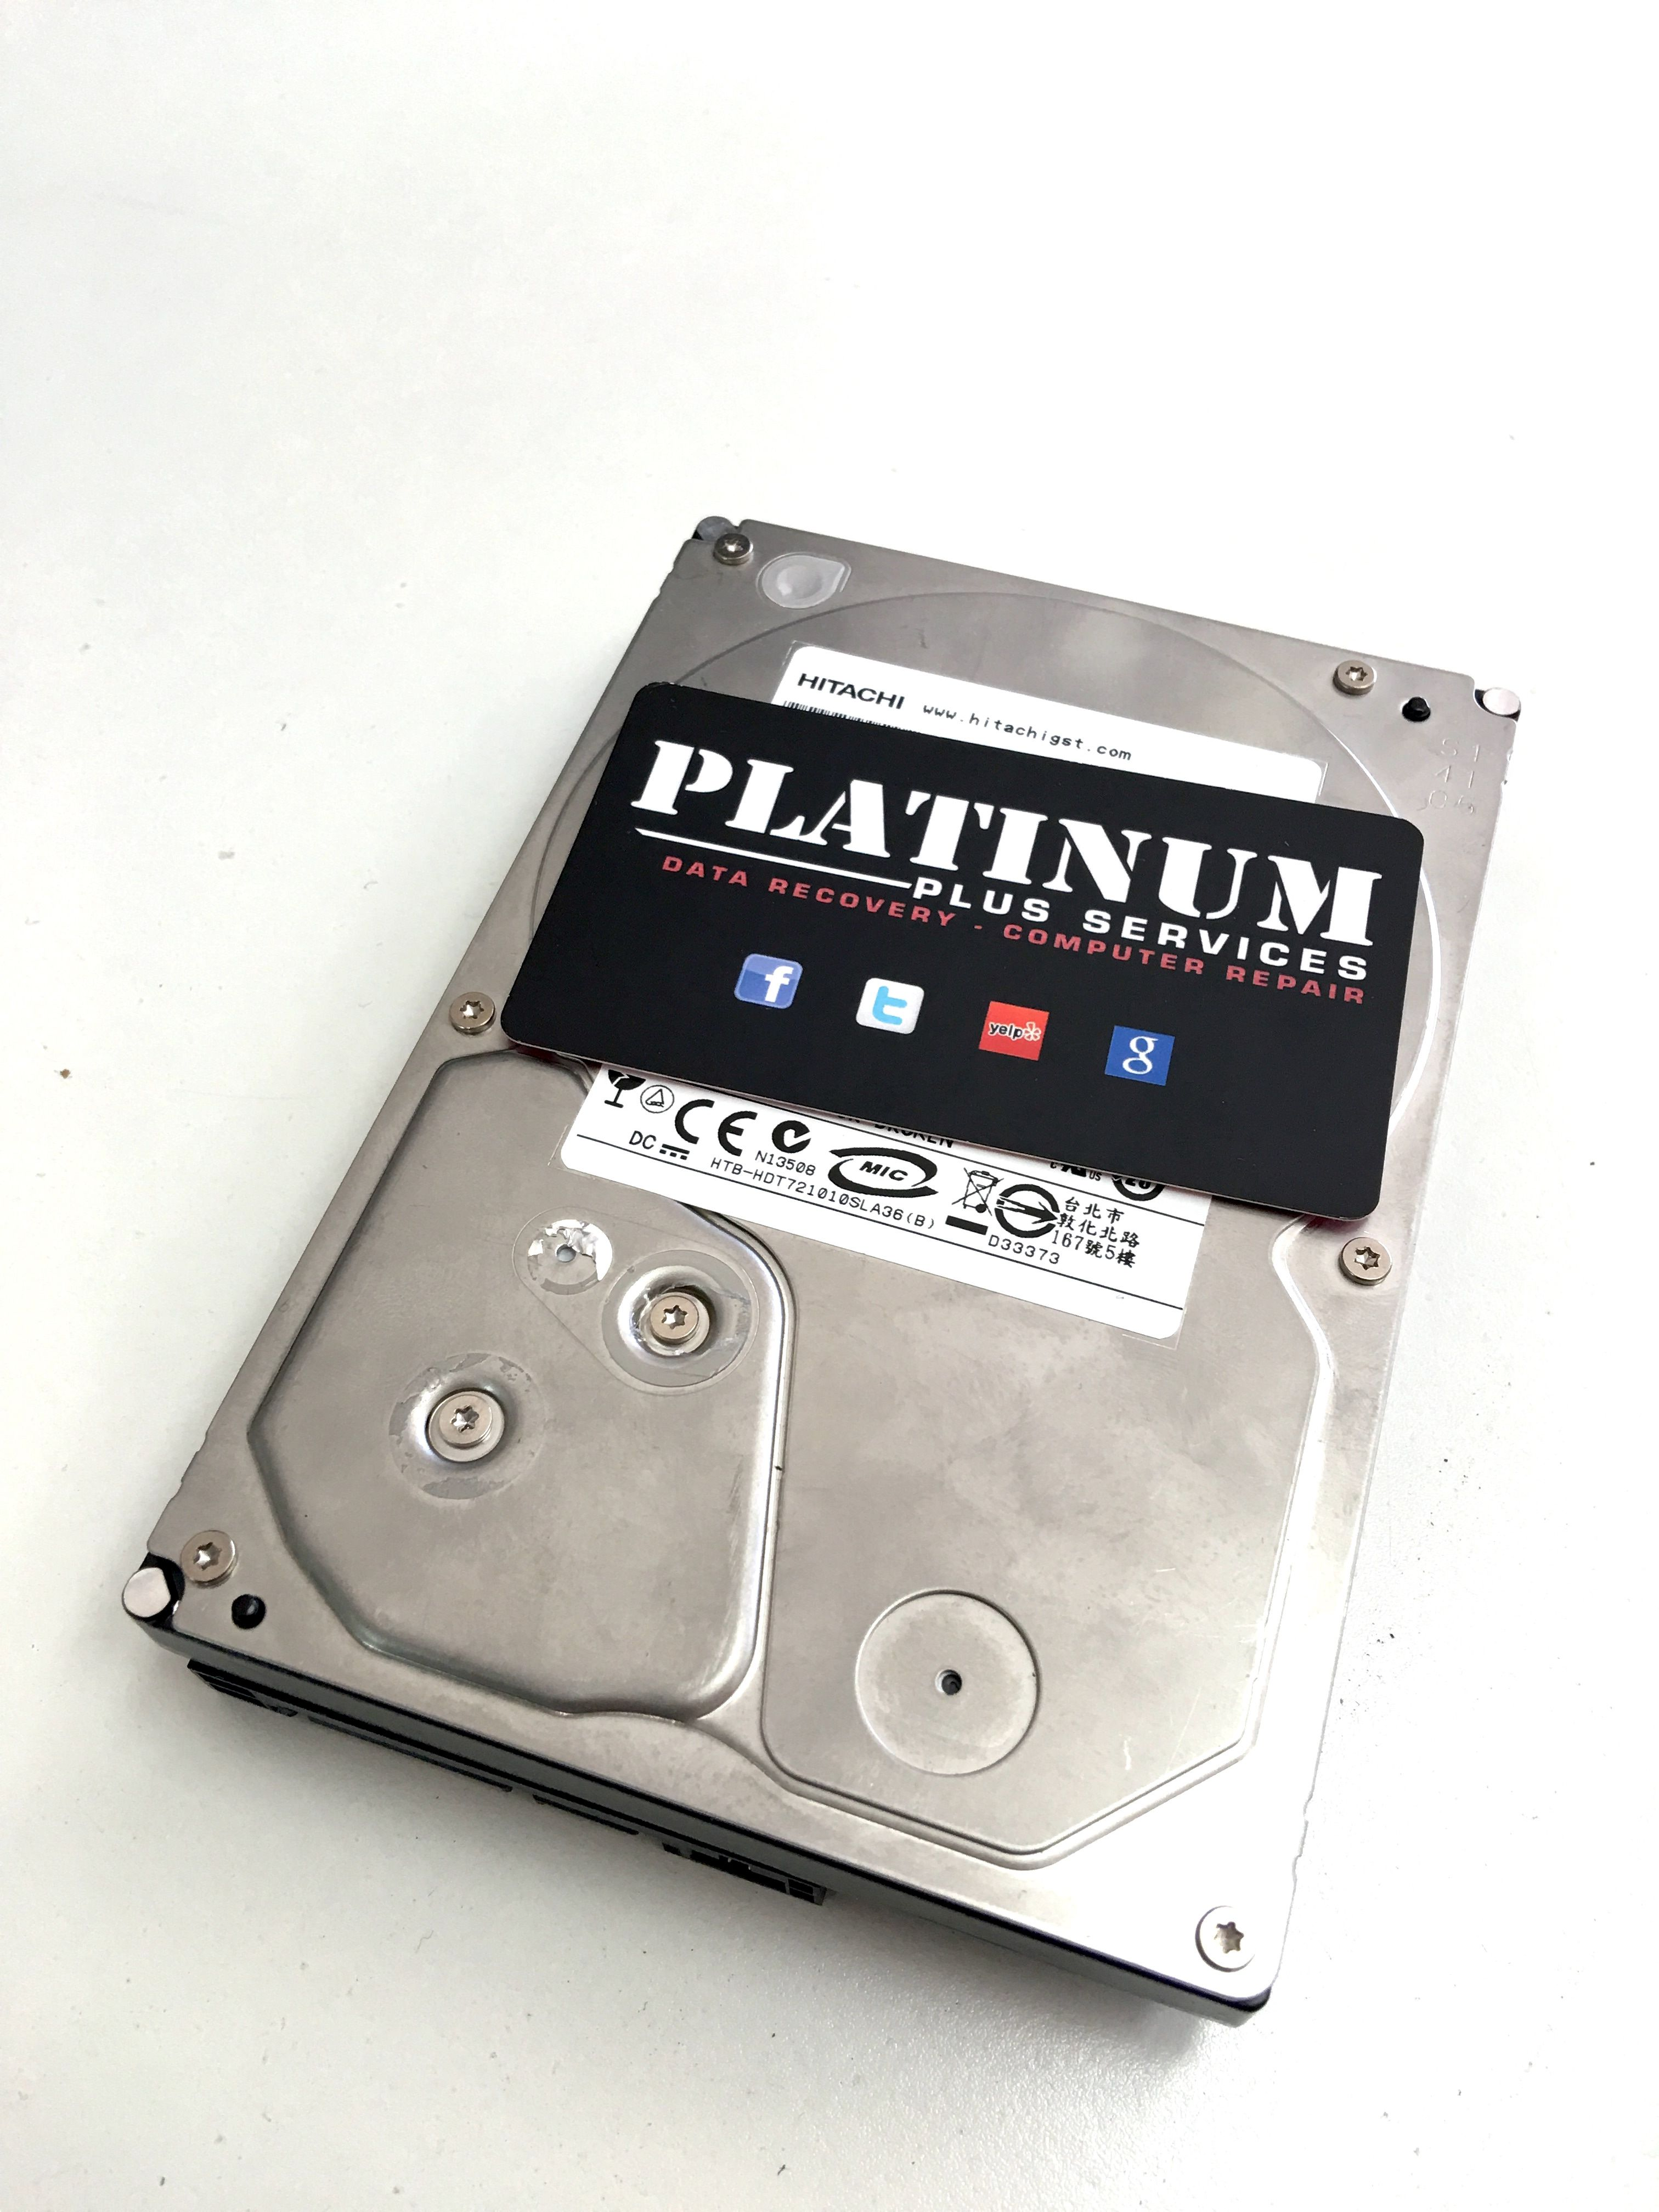 datarecovery hitachi internal hard drive we were able to retrieve